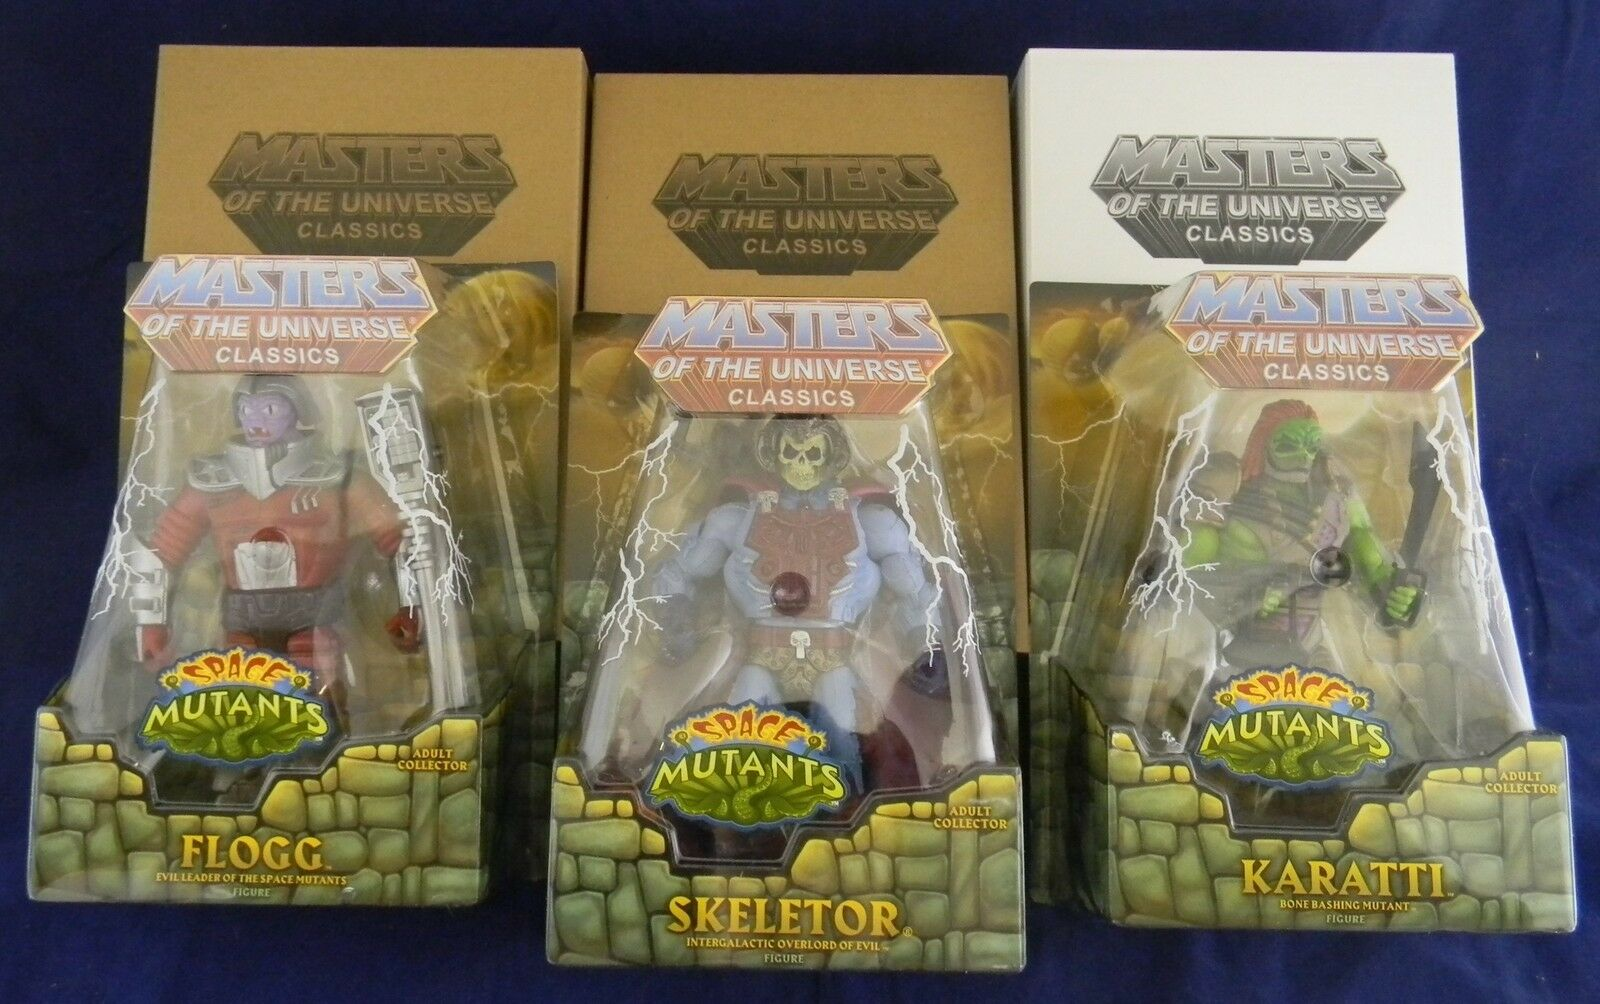 Masters of the Universe classeeics nuovo  Adventures Skeletor Flogg & Karatti nuovo  per offrirti un piacevole shopping online